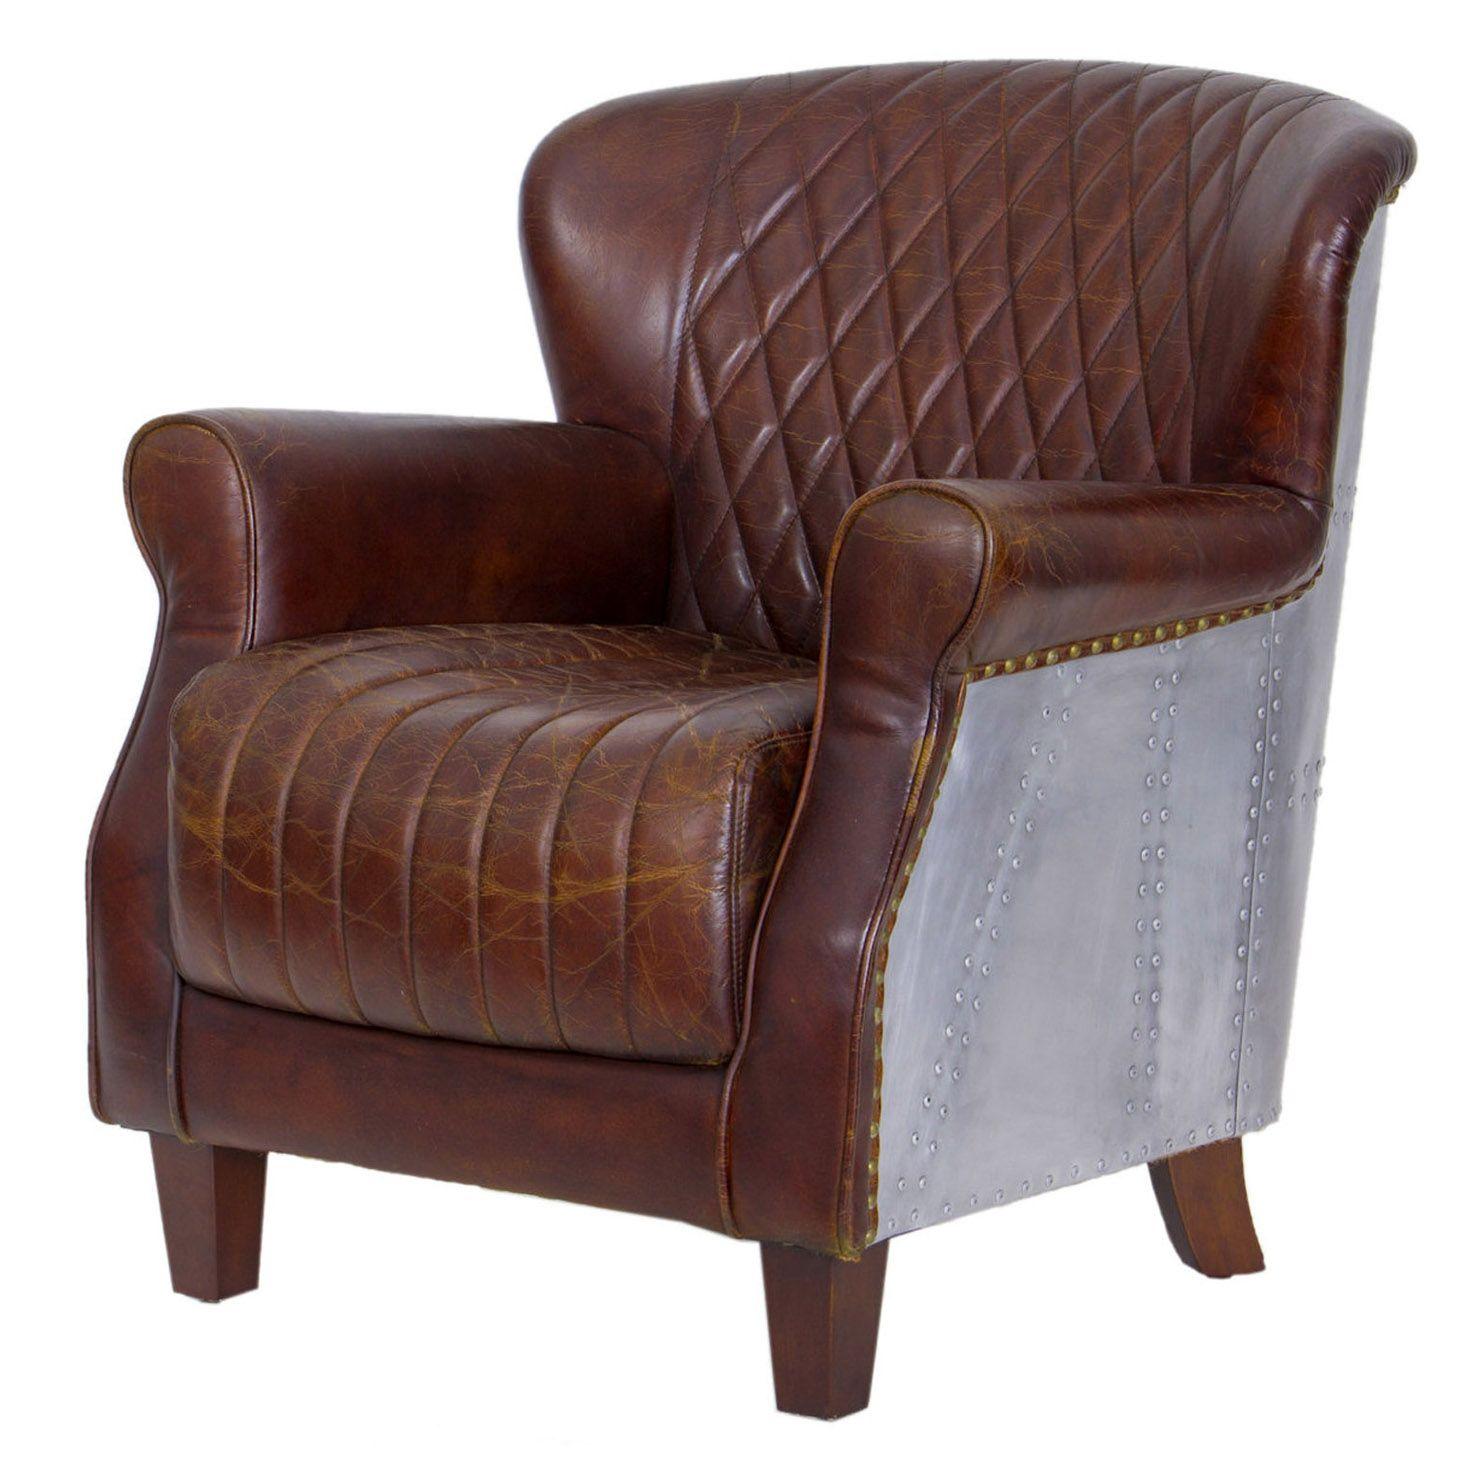 Vintage Furniture For Sale Online: Artisanti Vintage Leather Armchair